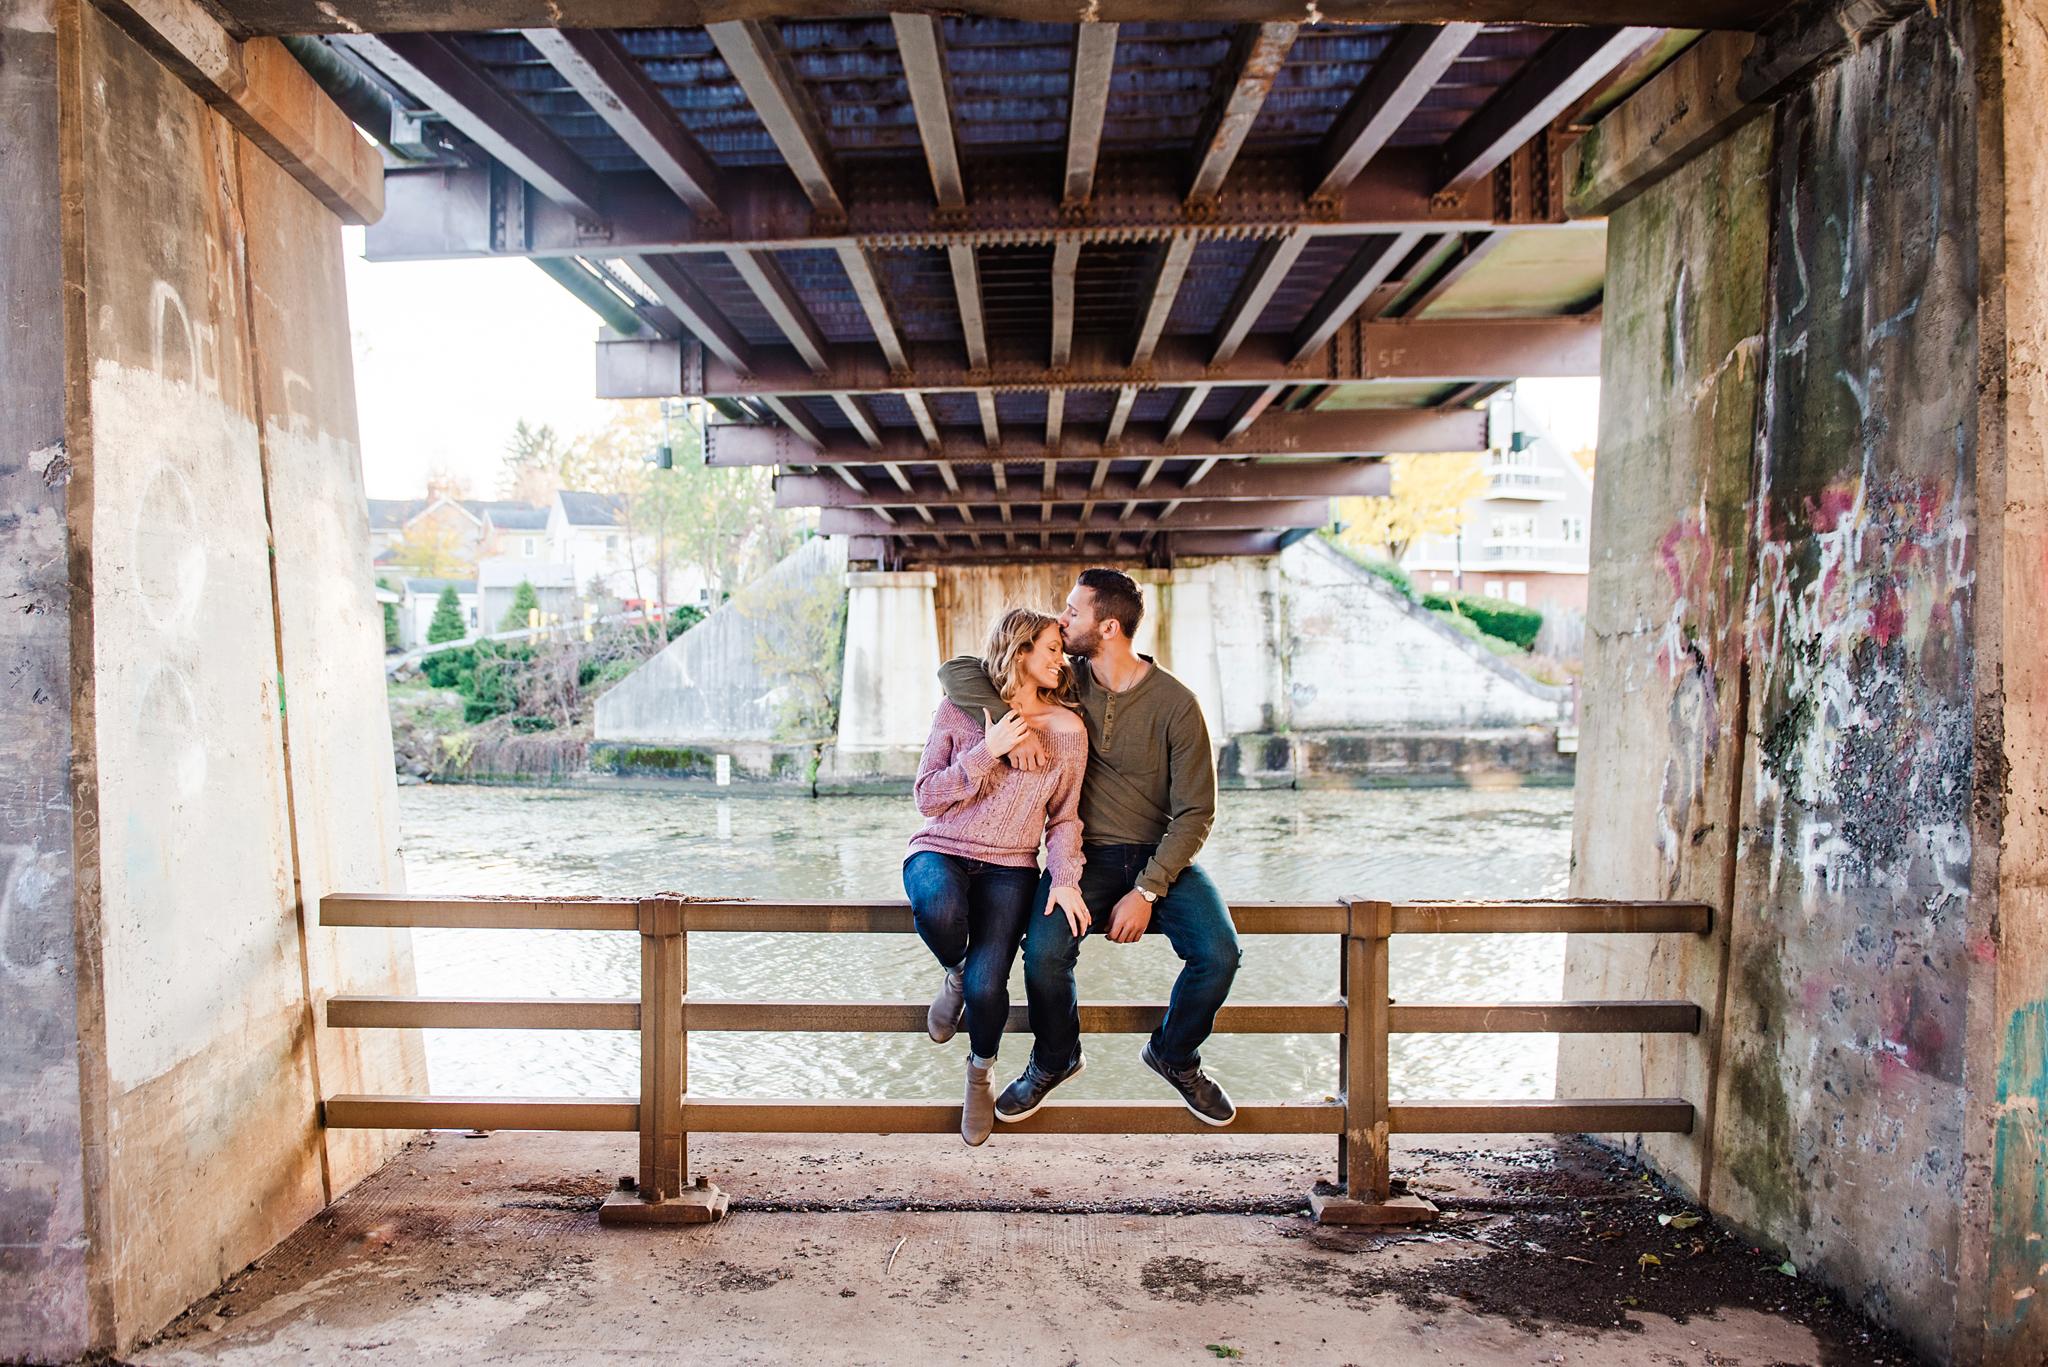 Village_of_Fairport_Rochester_Engagement_Session_JILL_STUDIO_Rochester_NY_Photographer_DSC_8558.jpg